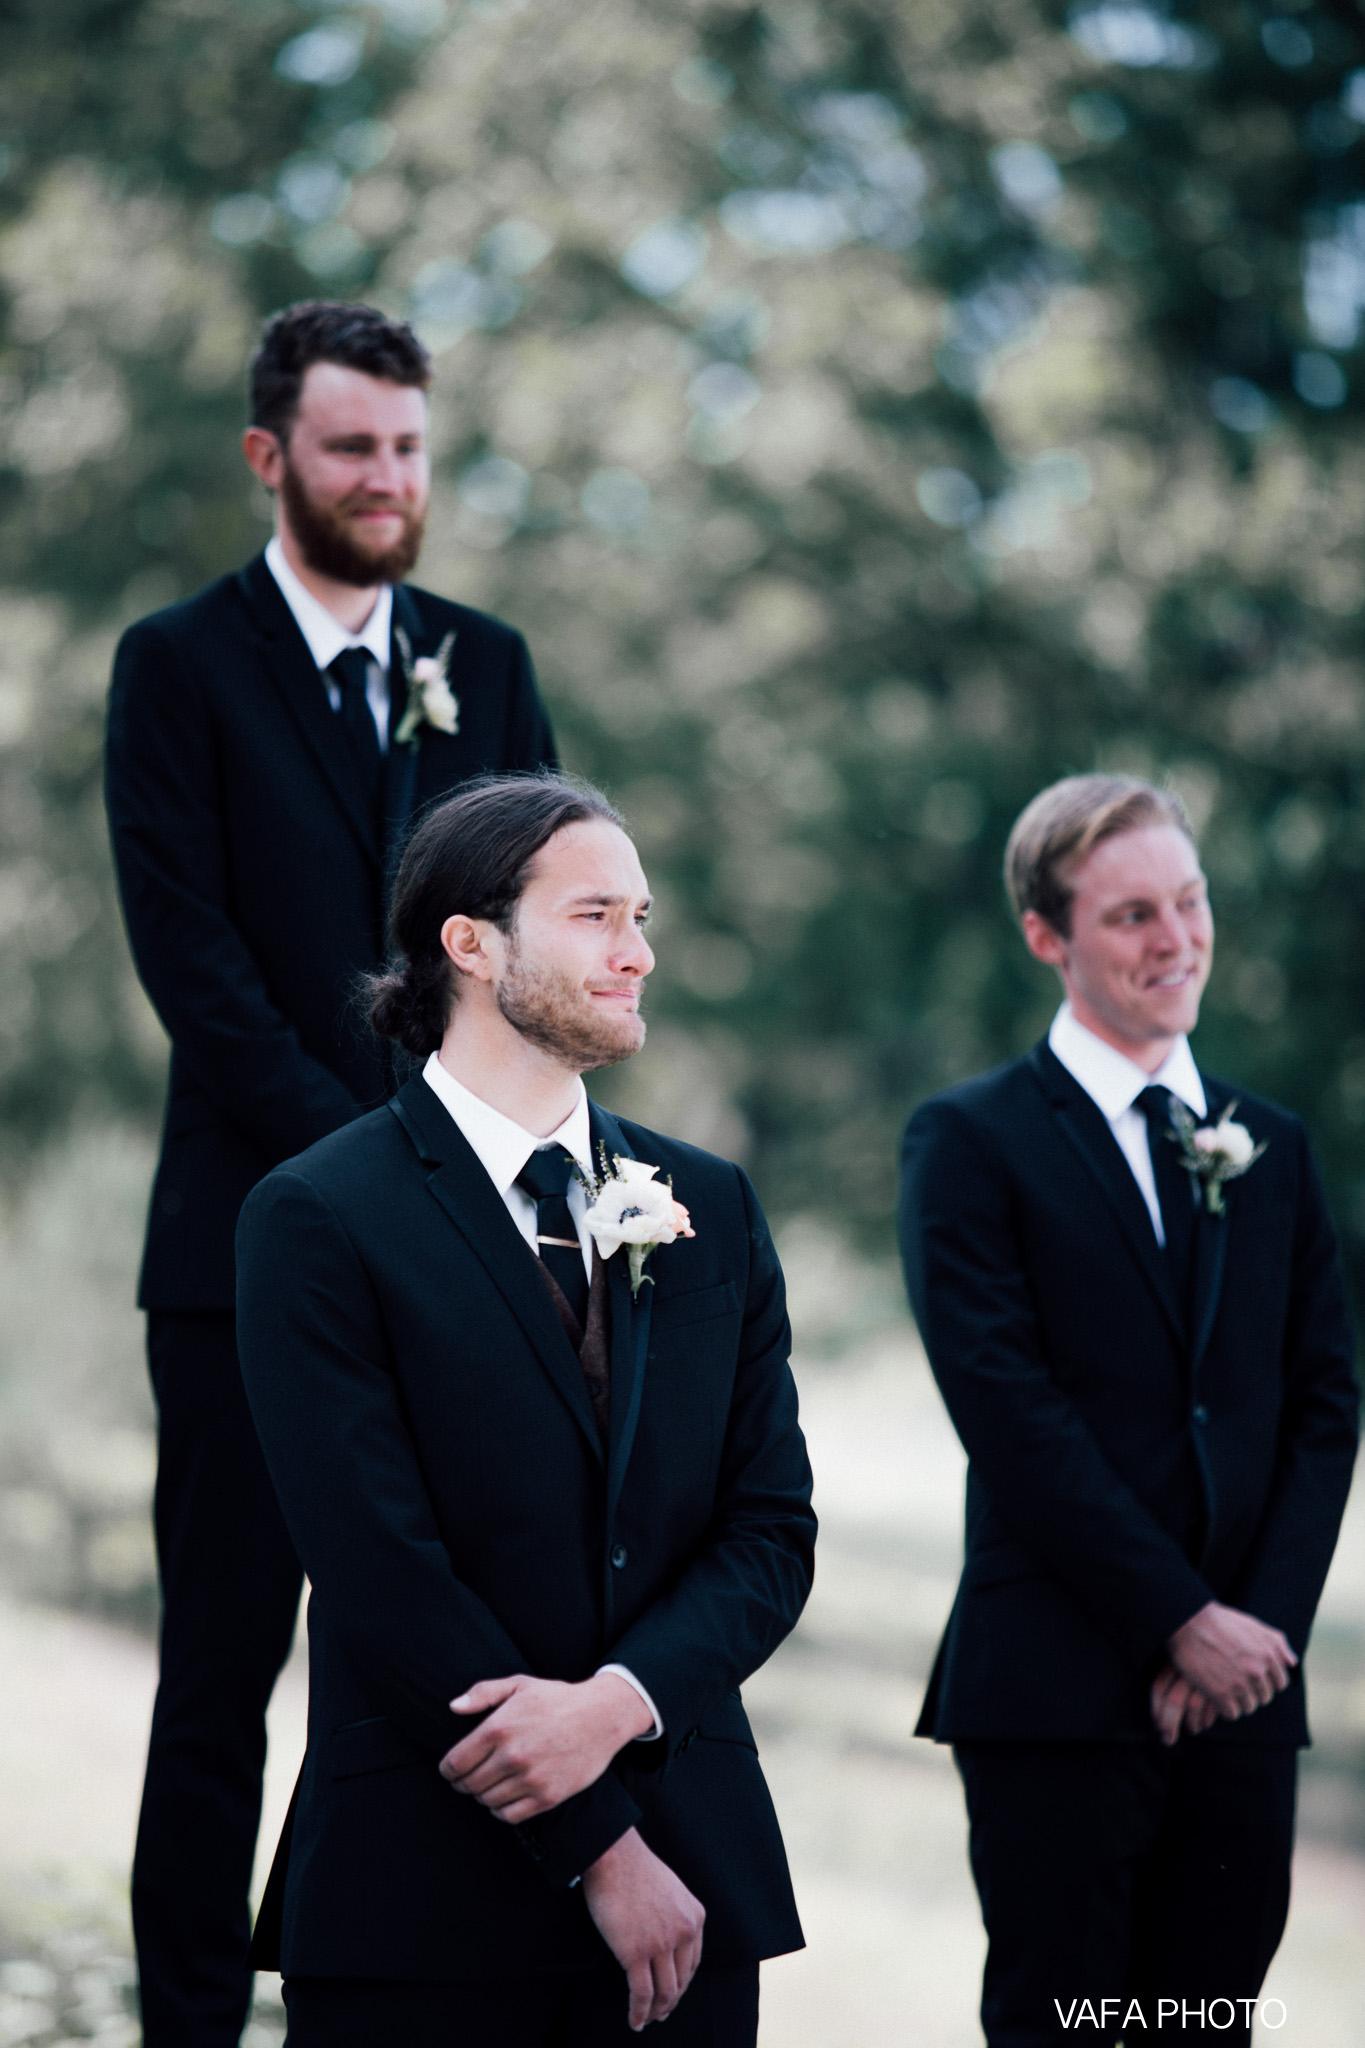 The-Felt-Estate-Wedding-Kailie-David-Vafa-Photo-303.jpg